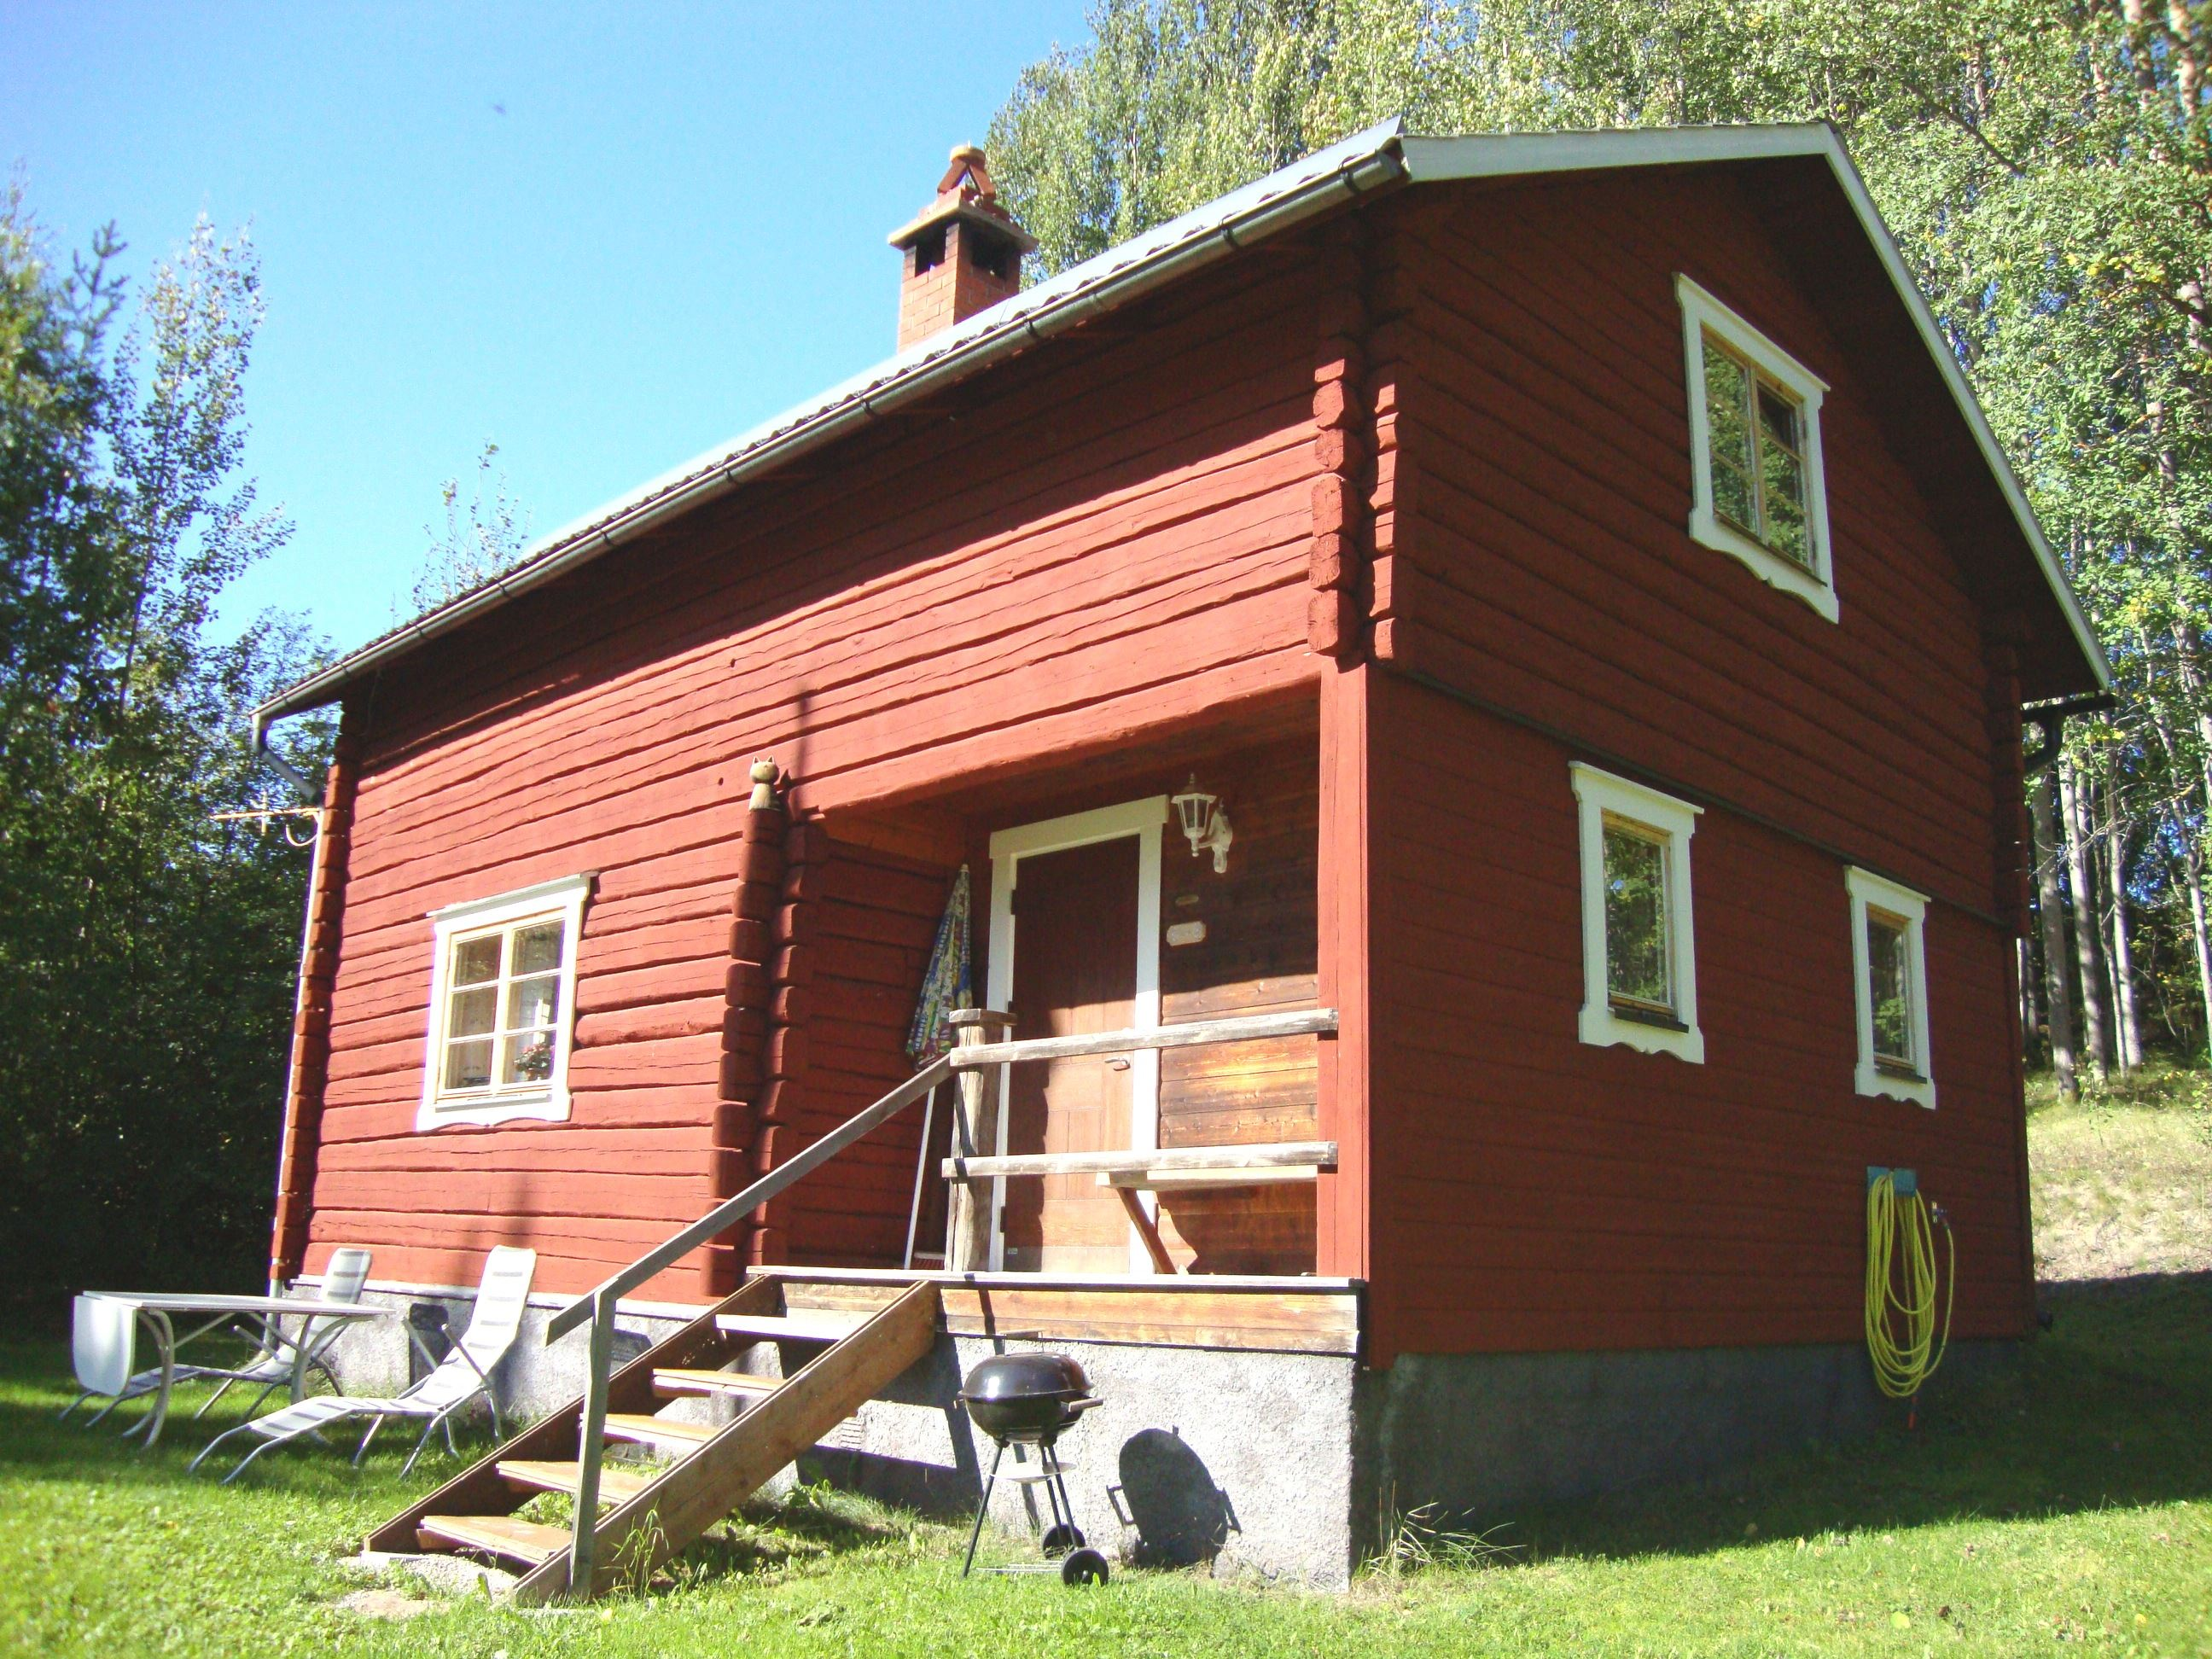 O303 Hansjö, 4 km N Orsa